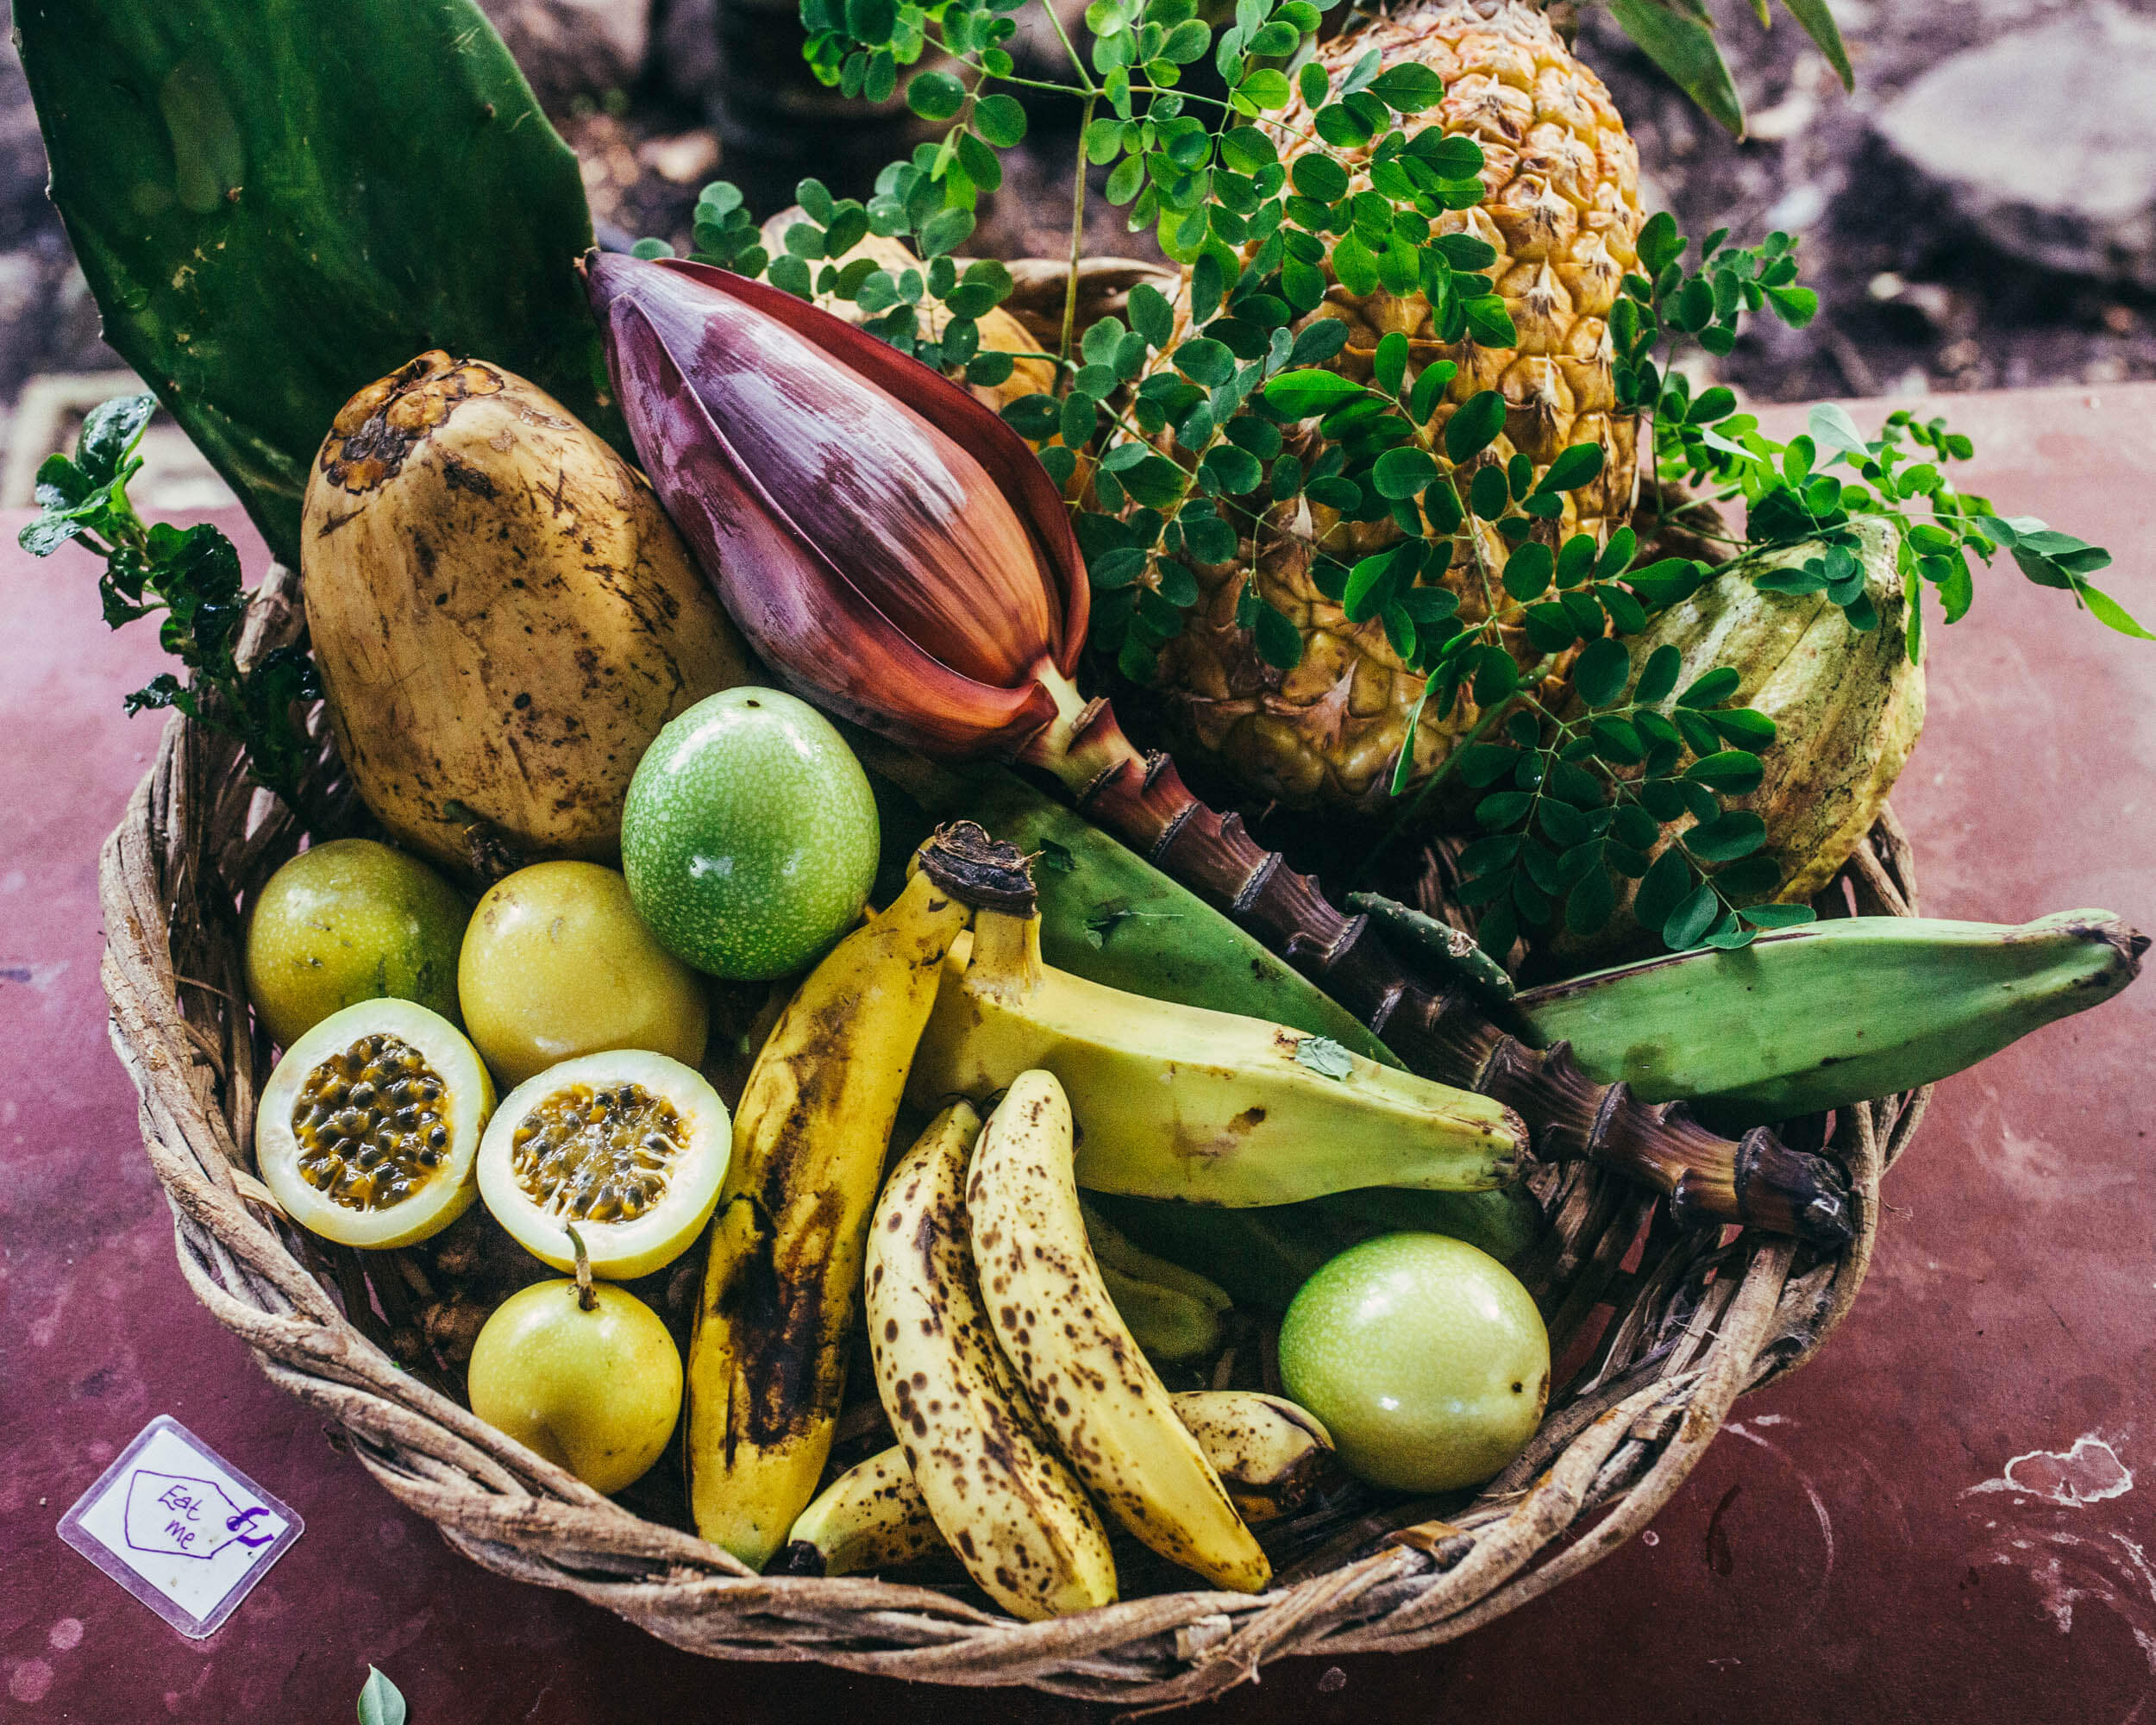 selection of seasonal fruits grown on the farm always available